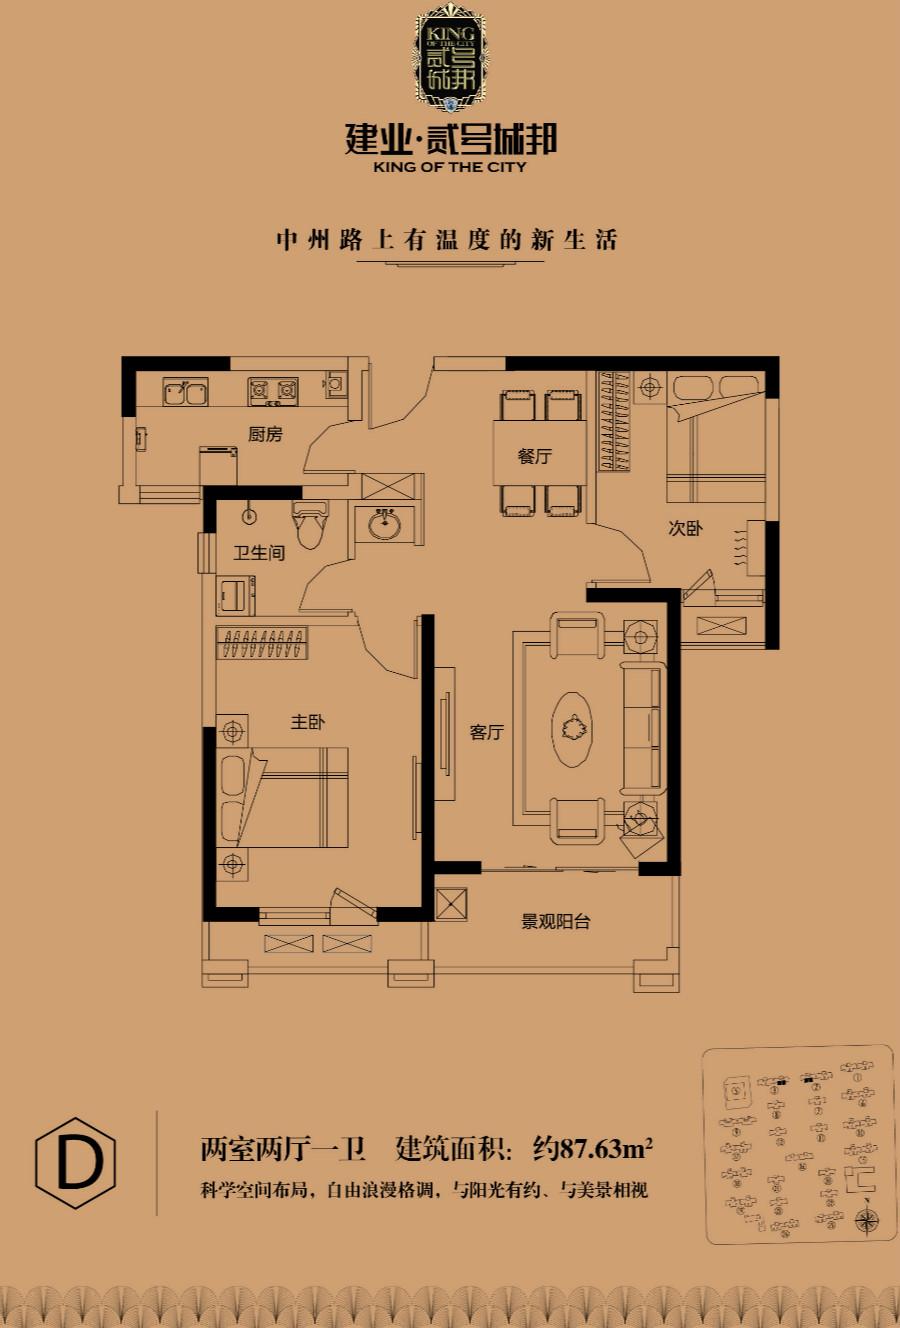 D户型【建业・贰号城邦二】D户型